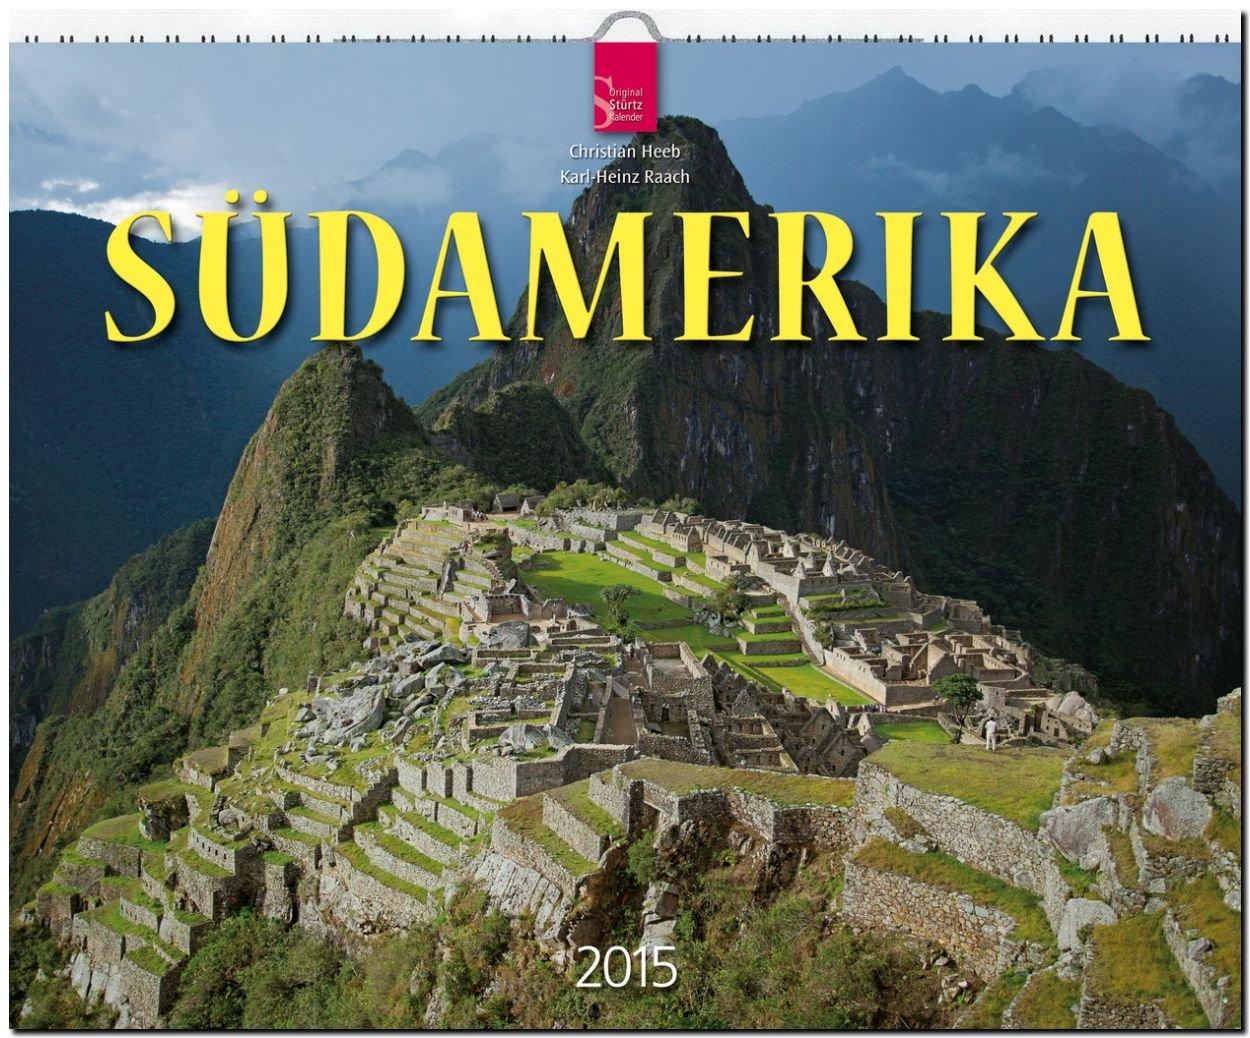 Südamerika 2015 - Original Stürtz-Kalender - Großformat-Kalender 60 x 48 cm